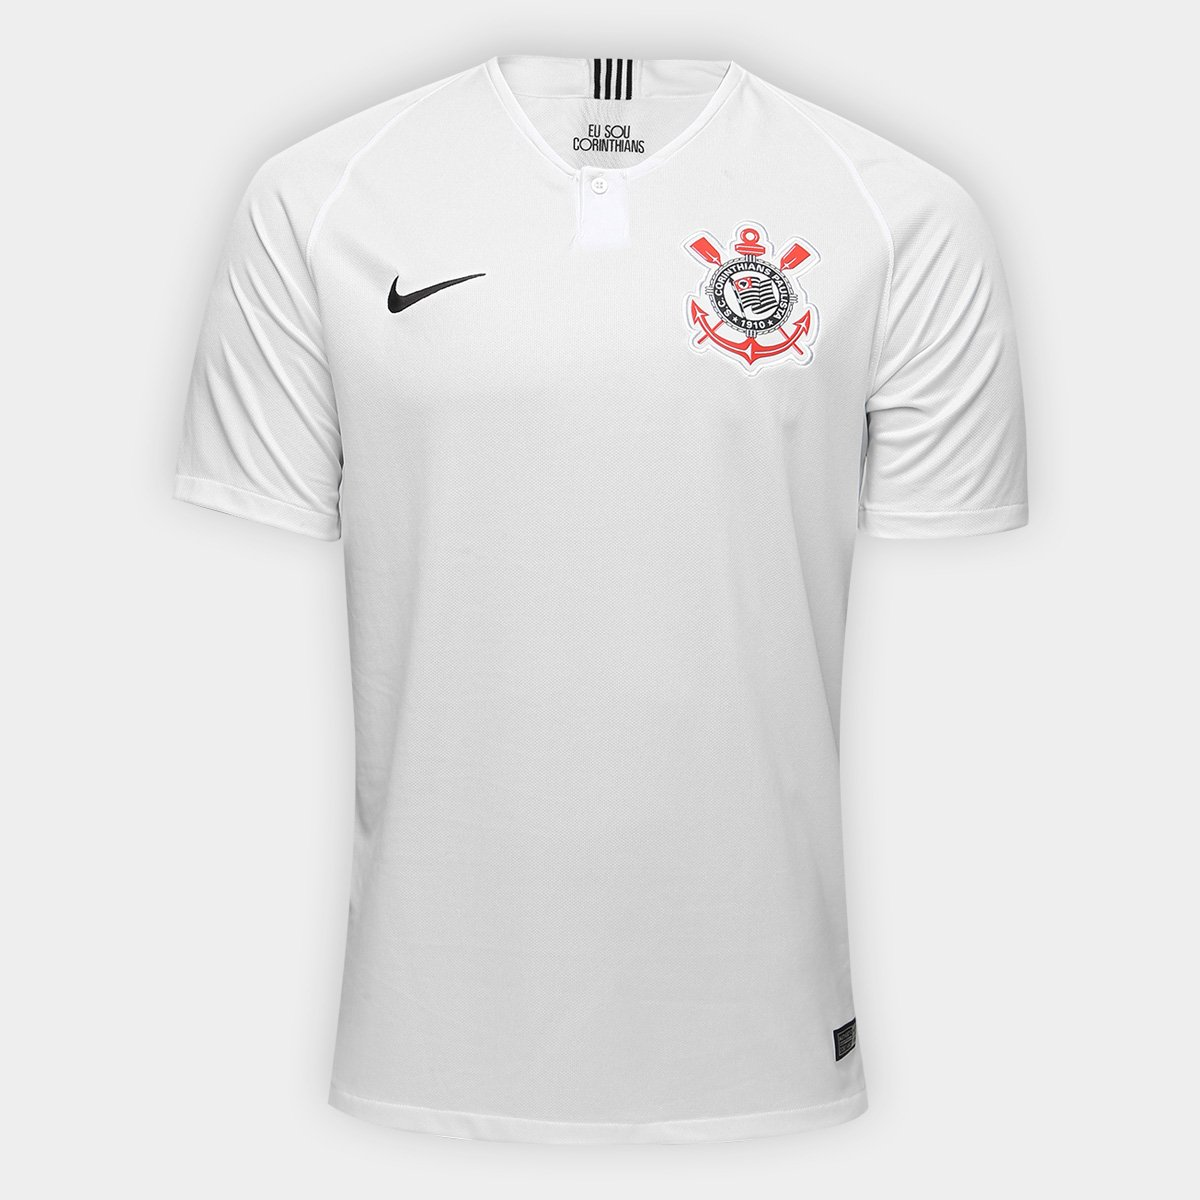 1ecd6d2393 Camisa Corinthians I 18 19 s n° Torcedor Nike - Patch Democracia ...